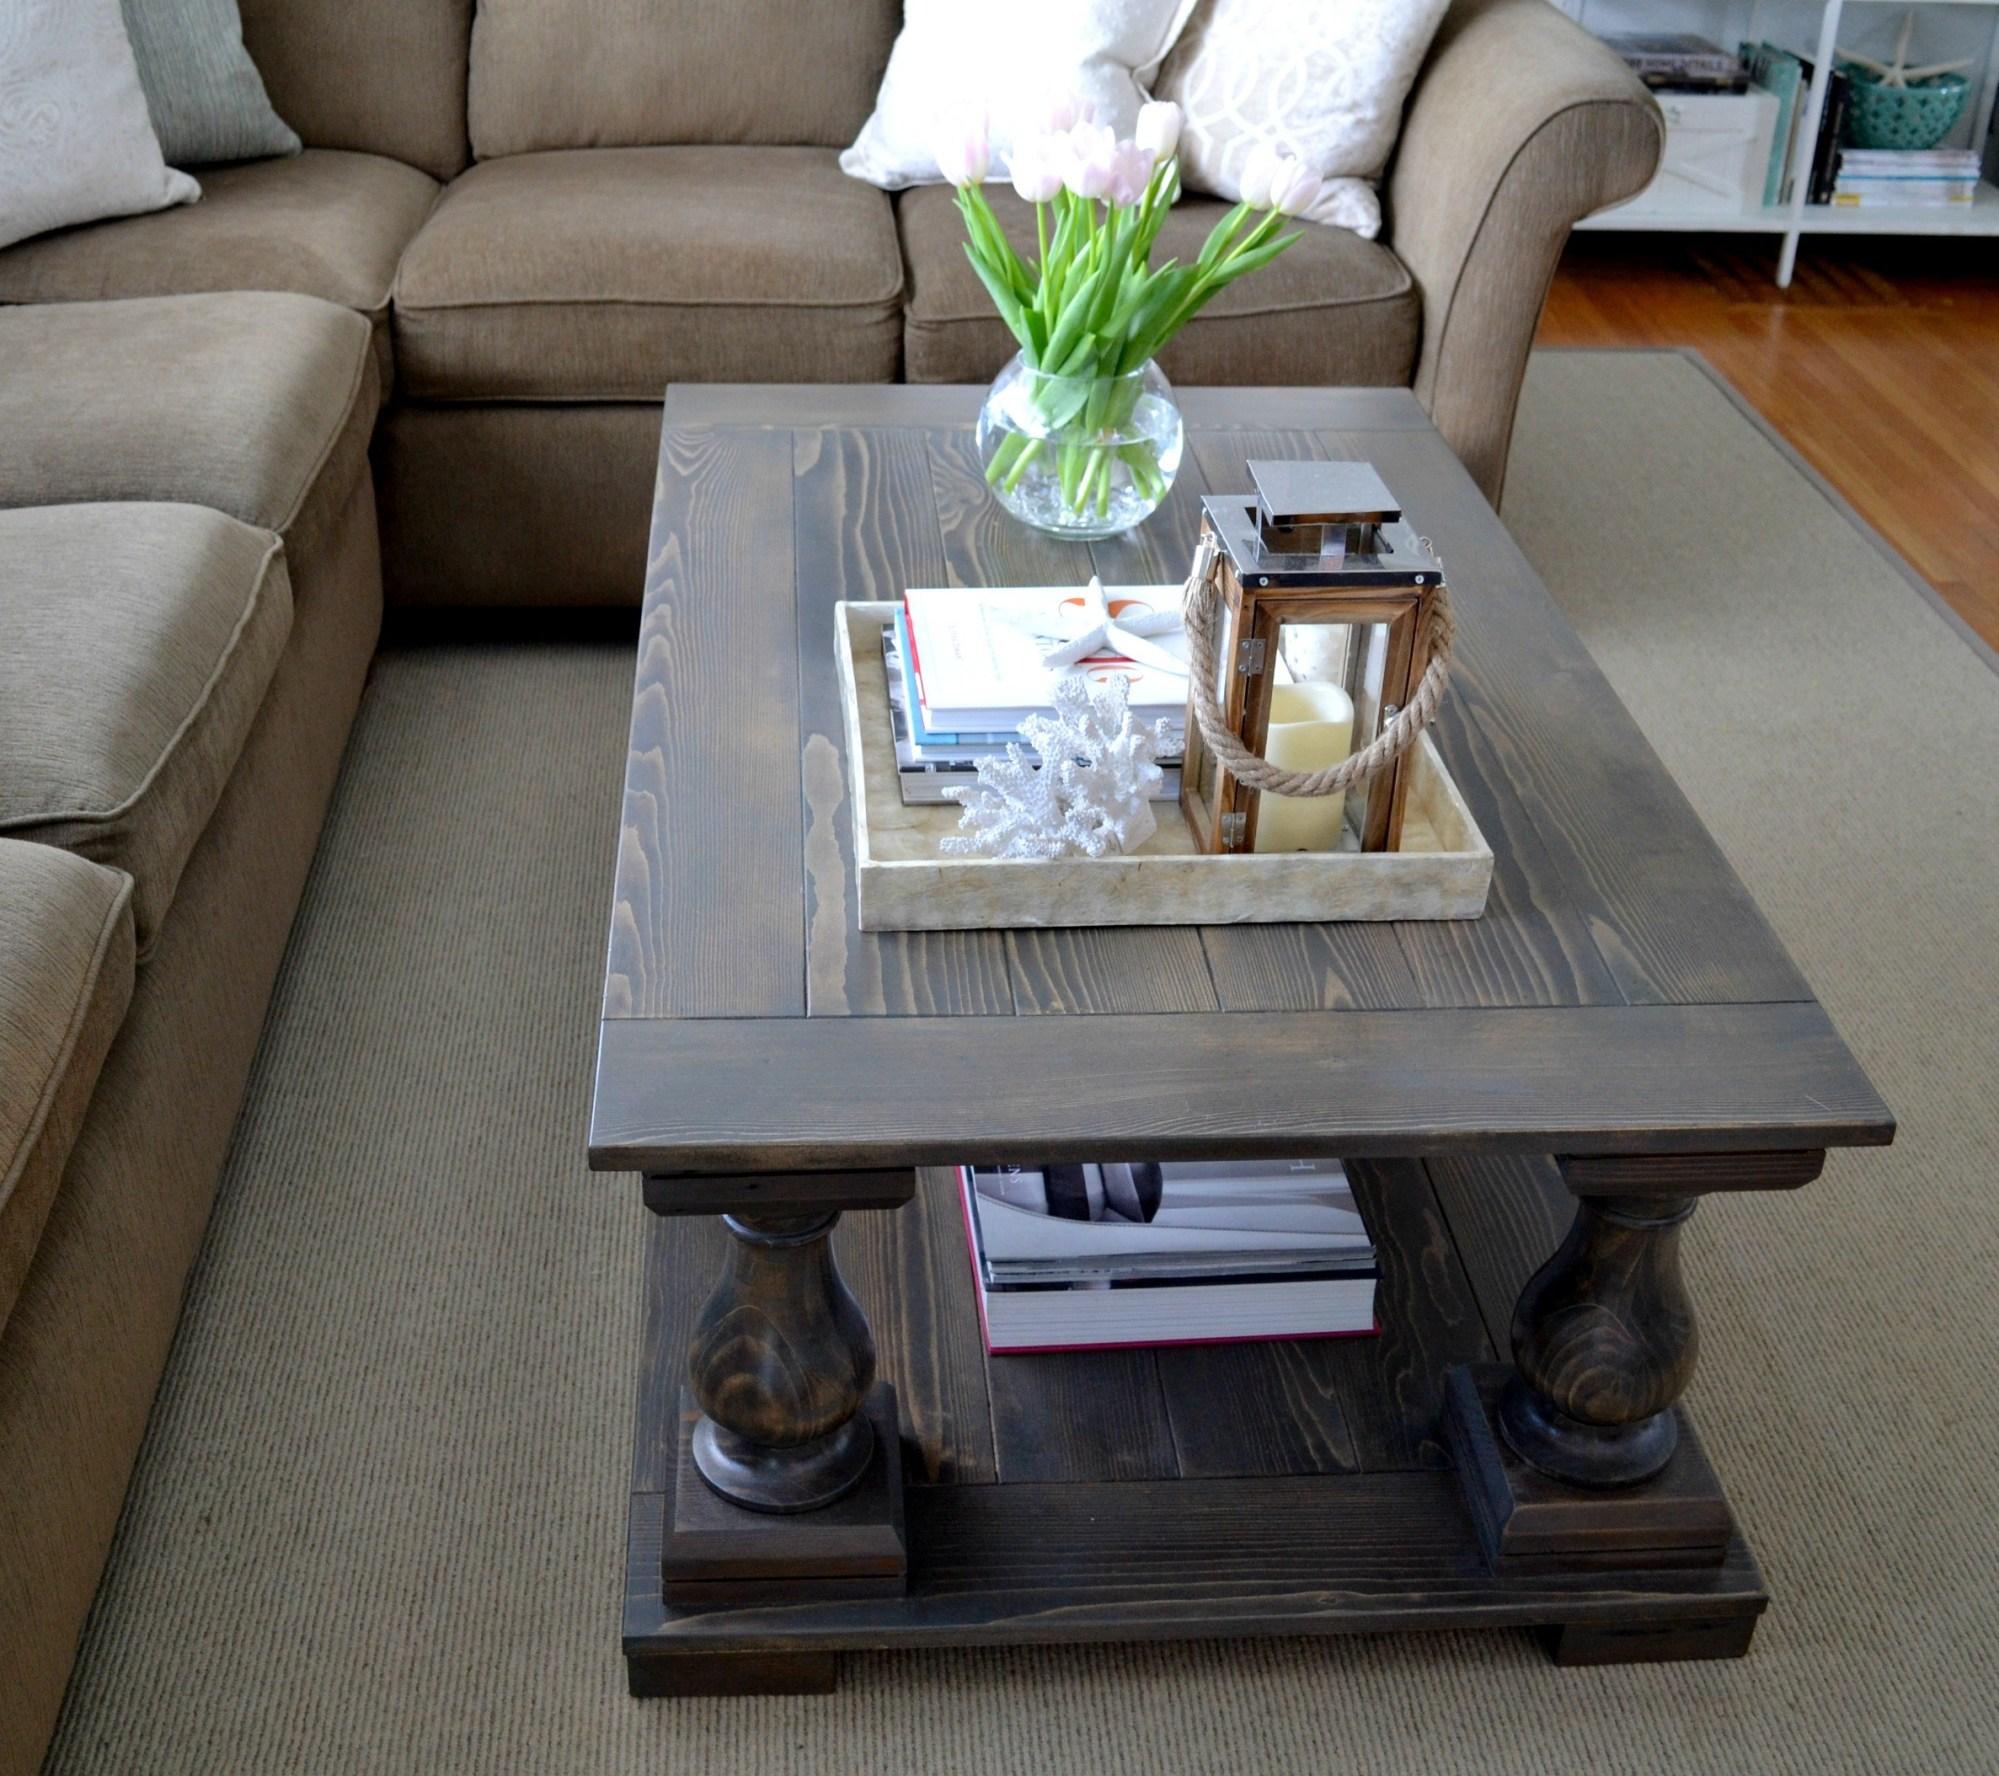 Restoration Hardware Balustrade Coffee Table Knockoff Toni Schefer Design